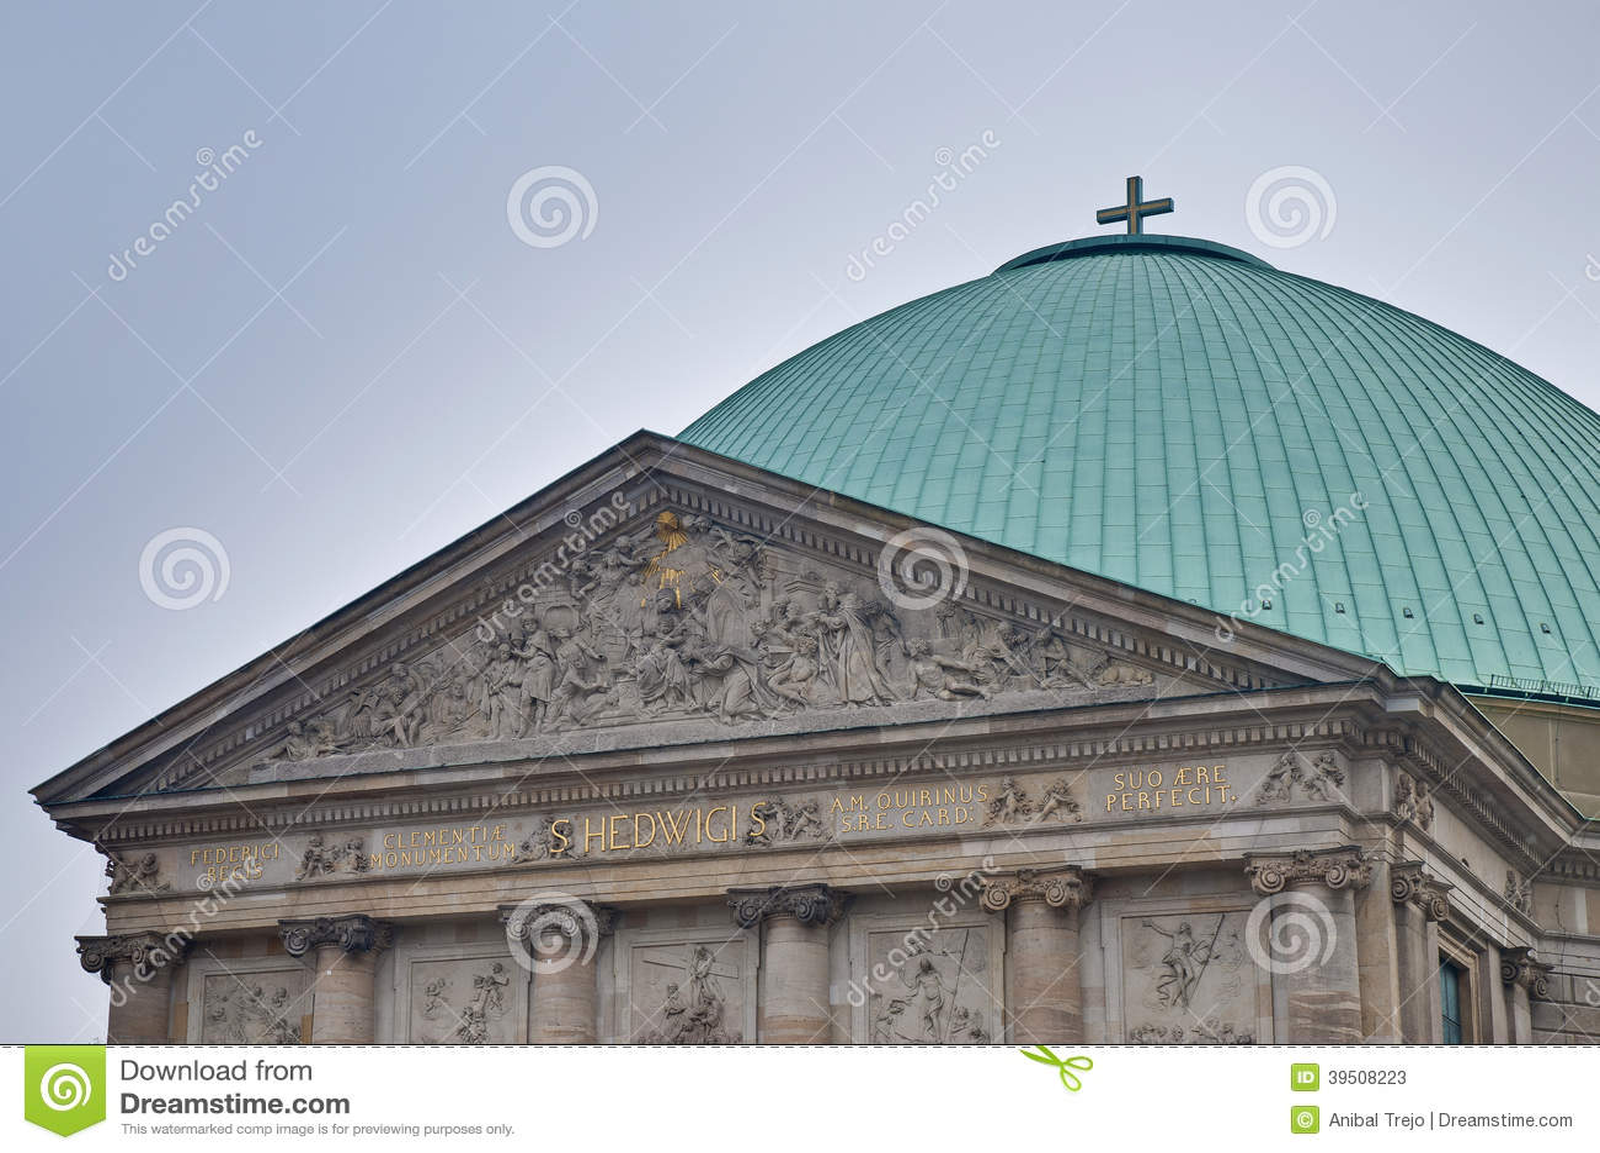 Sankt-Hedwigs-Kathedrale in Berlin, Germany